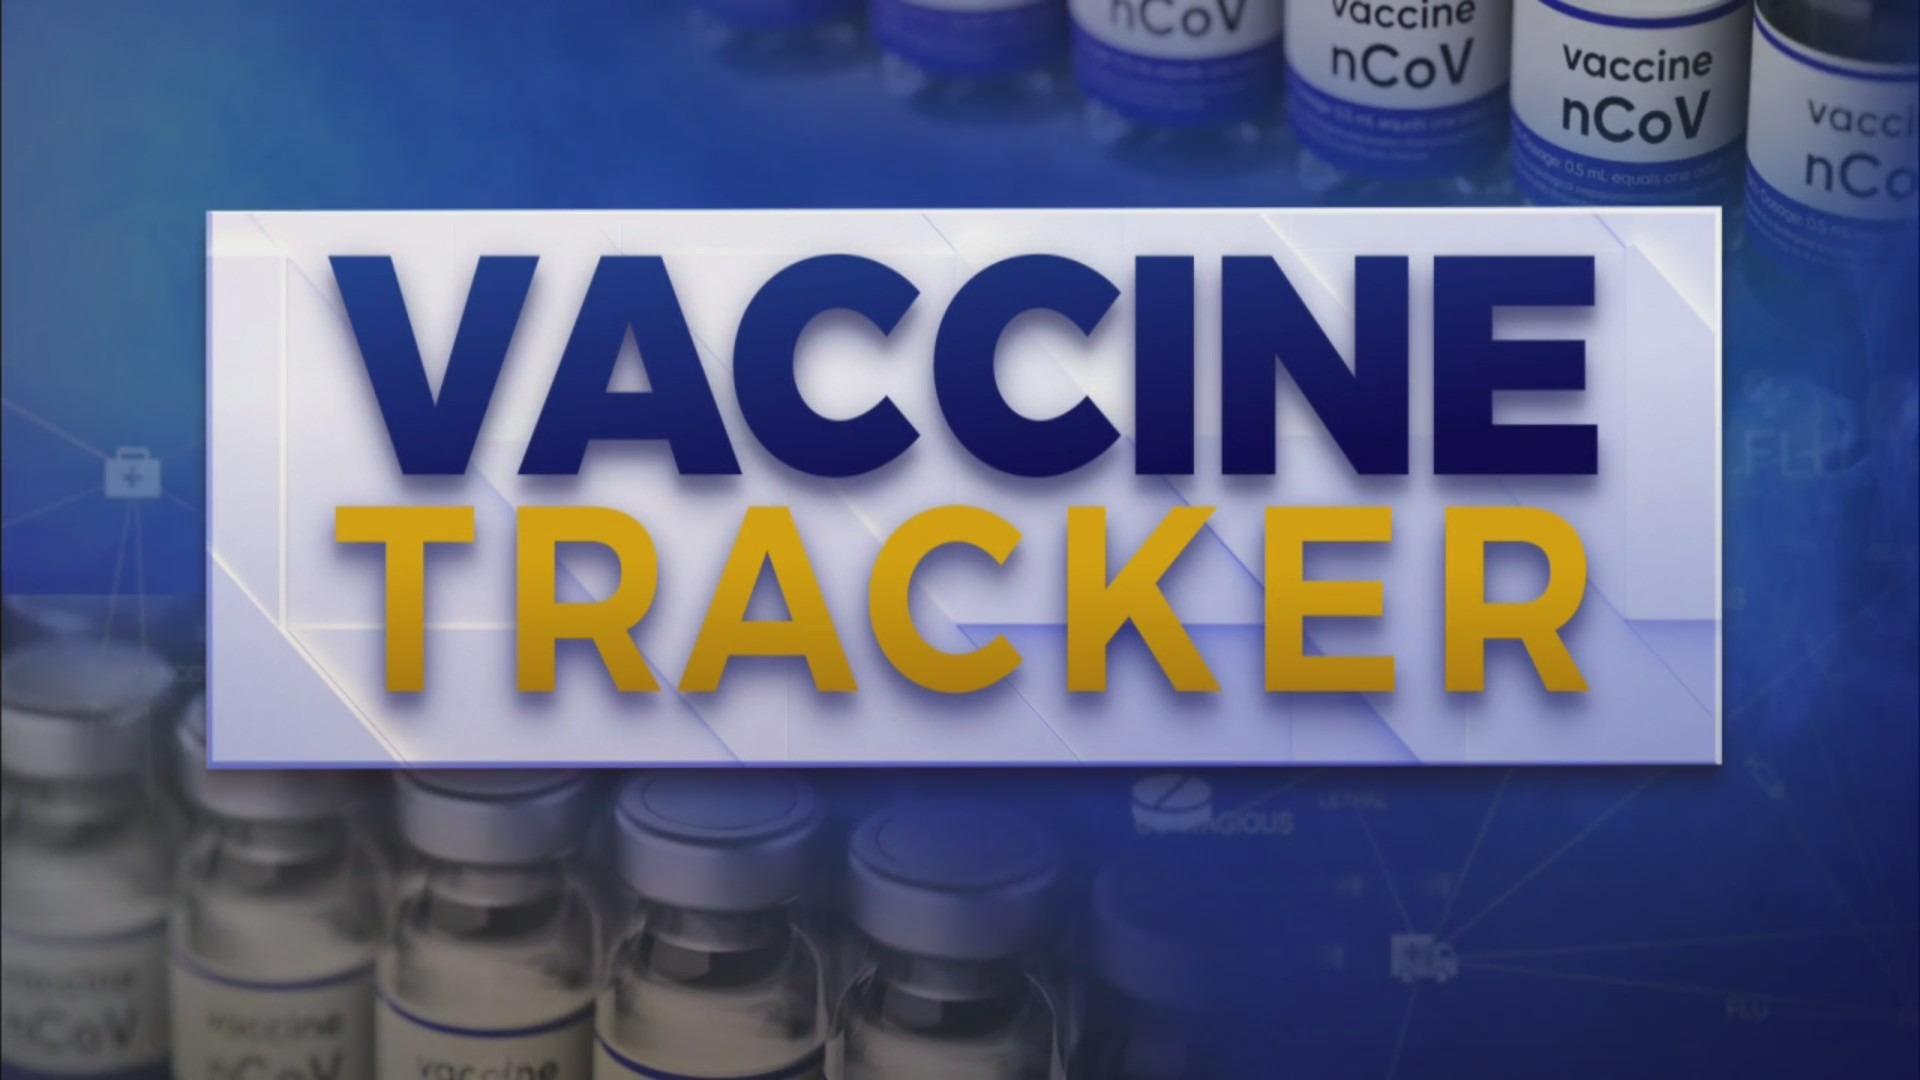 Vaccine tracker